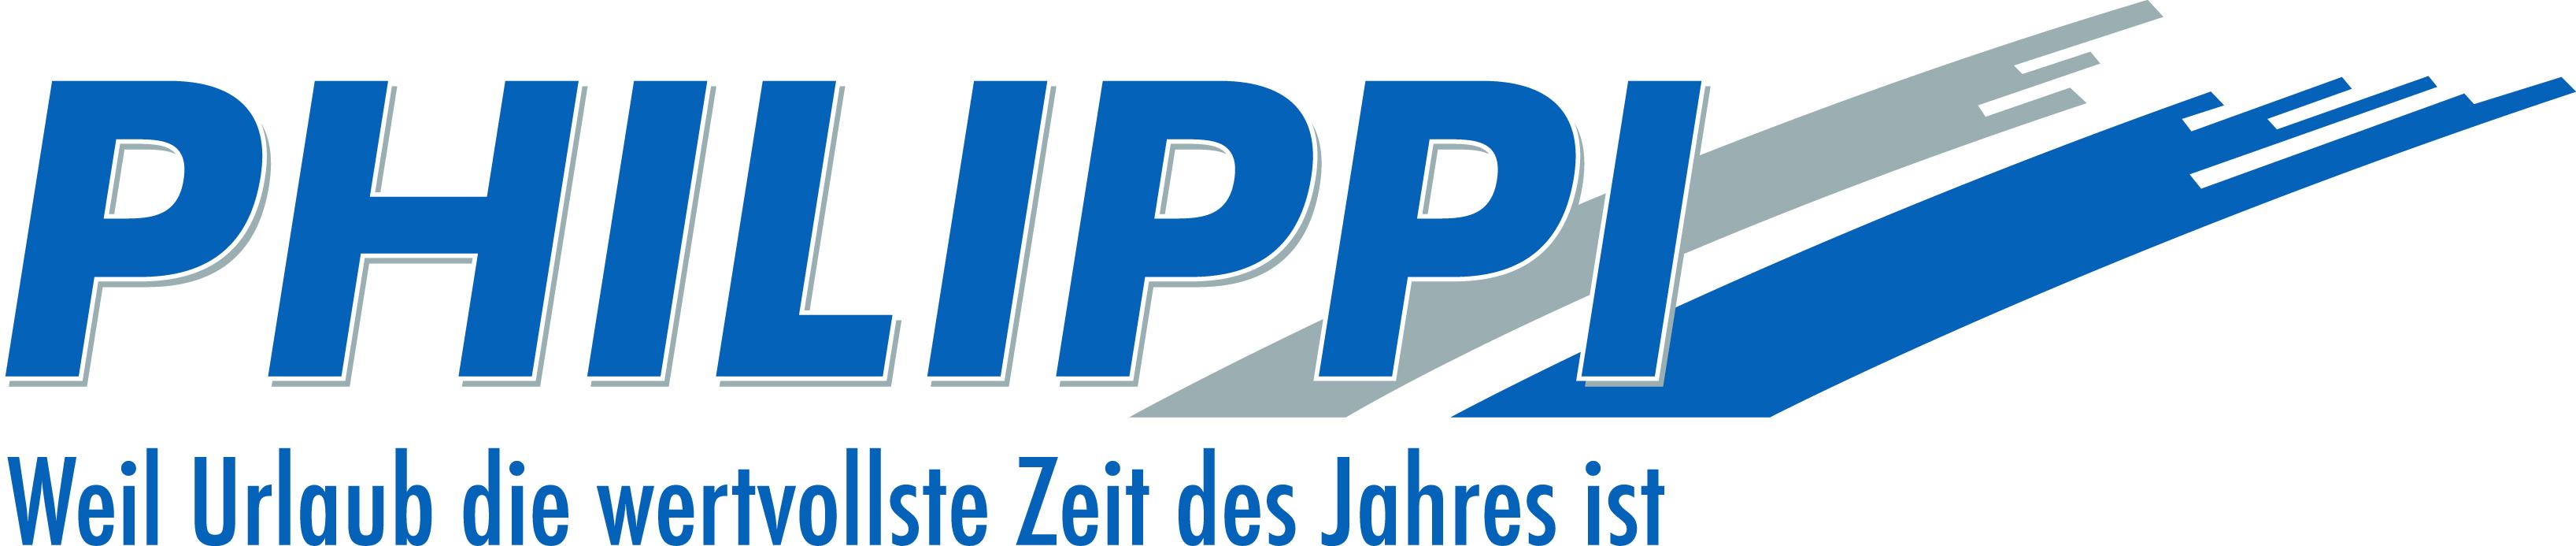 Philippi Reisen